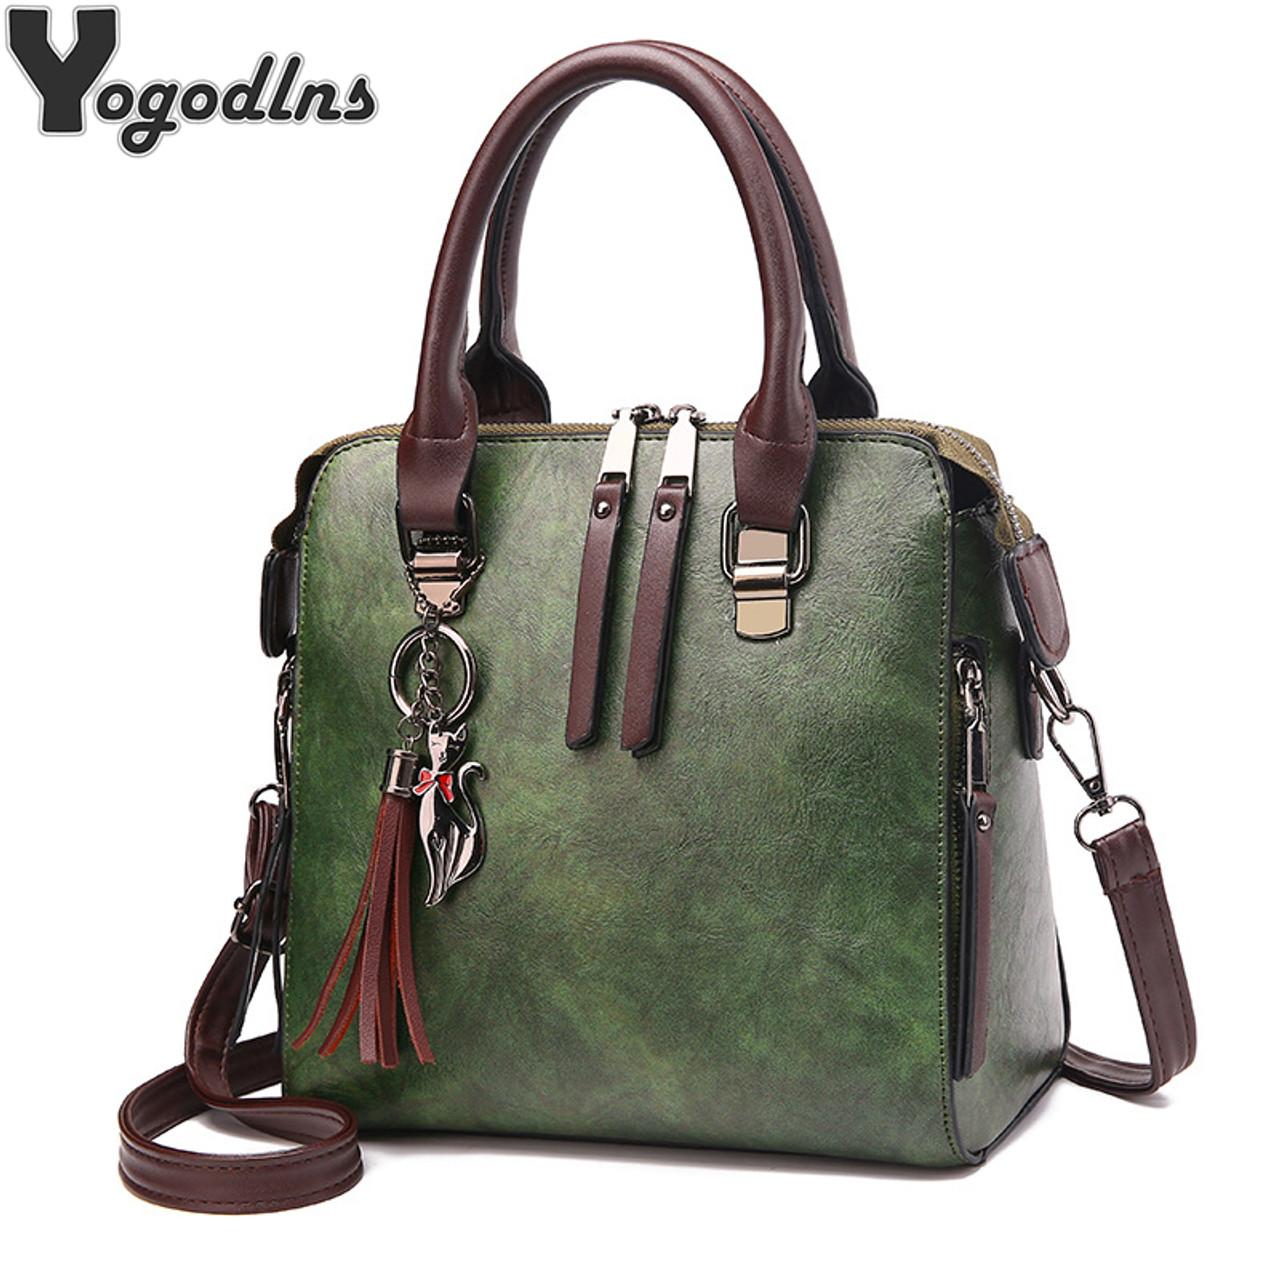 Vintage Leather Ladies HandBags Women Messenger Bags TotesTassel Designer  Crossbody Shoulder Bag Boston Hand Bags Hot Sale - OnshopDeals.Com fe08279591d02